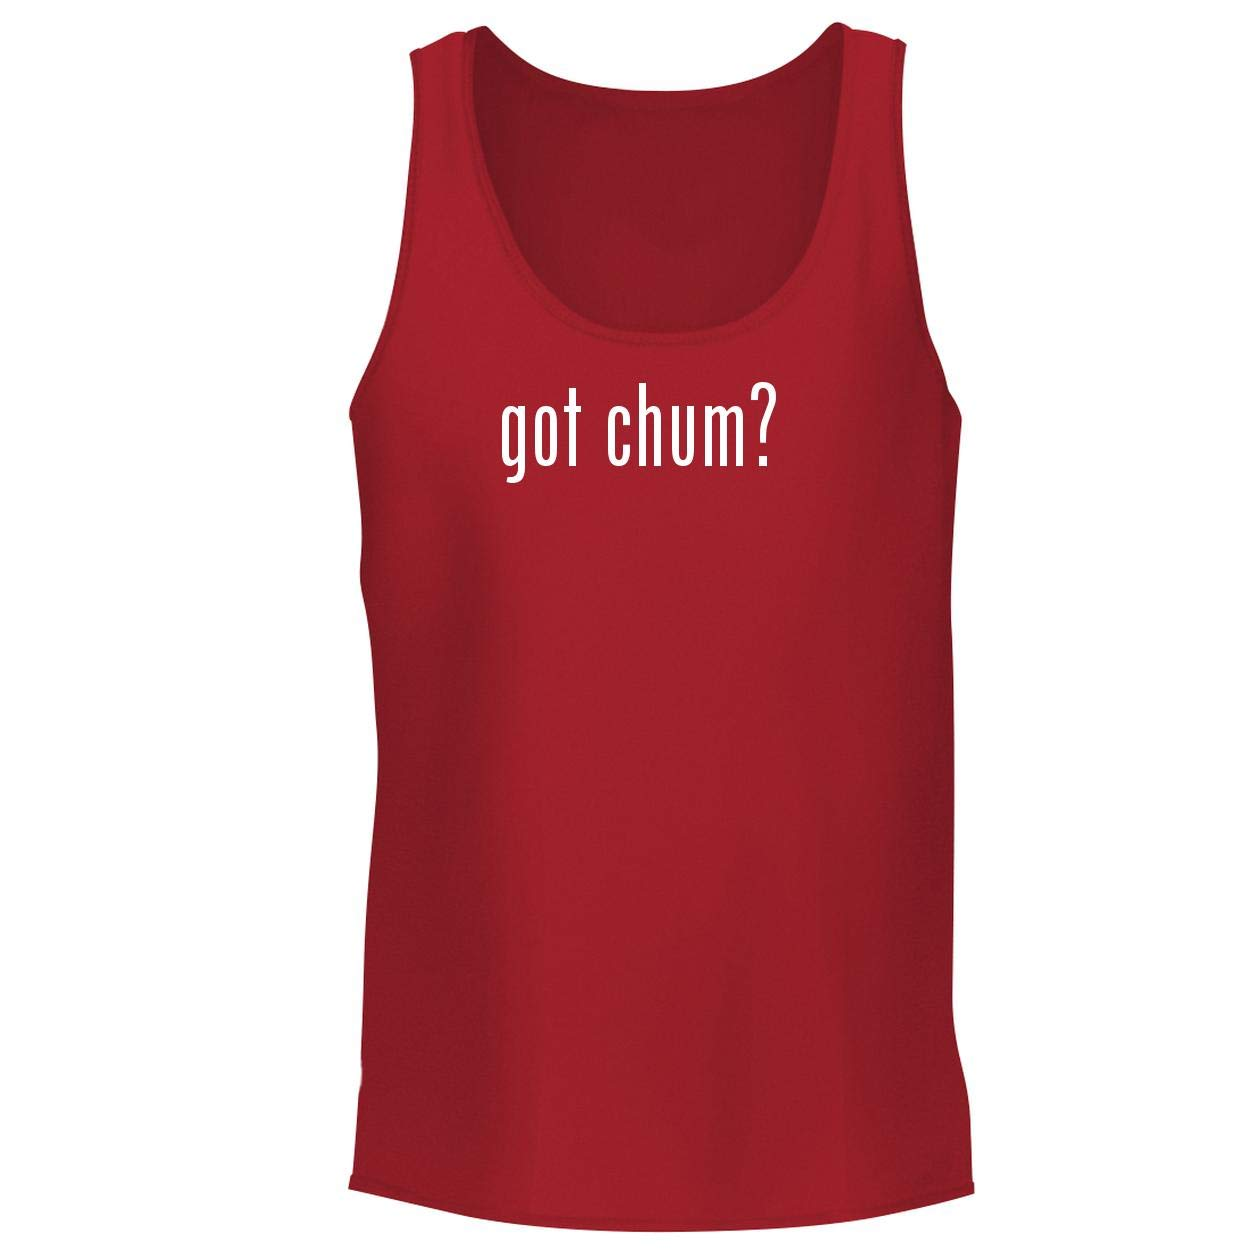 50cbcf50c2ead Amazon.com  got chum  - Men s Graphic Tank Top  Clothing